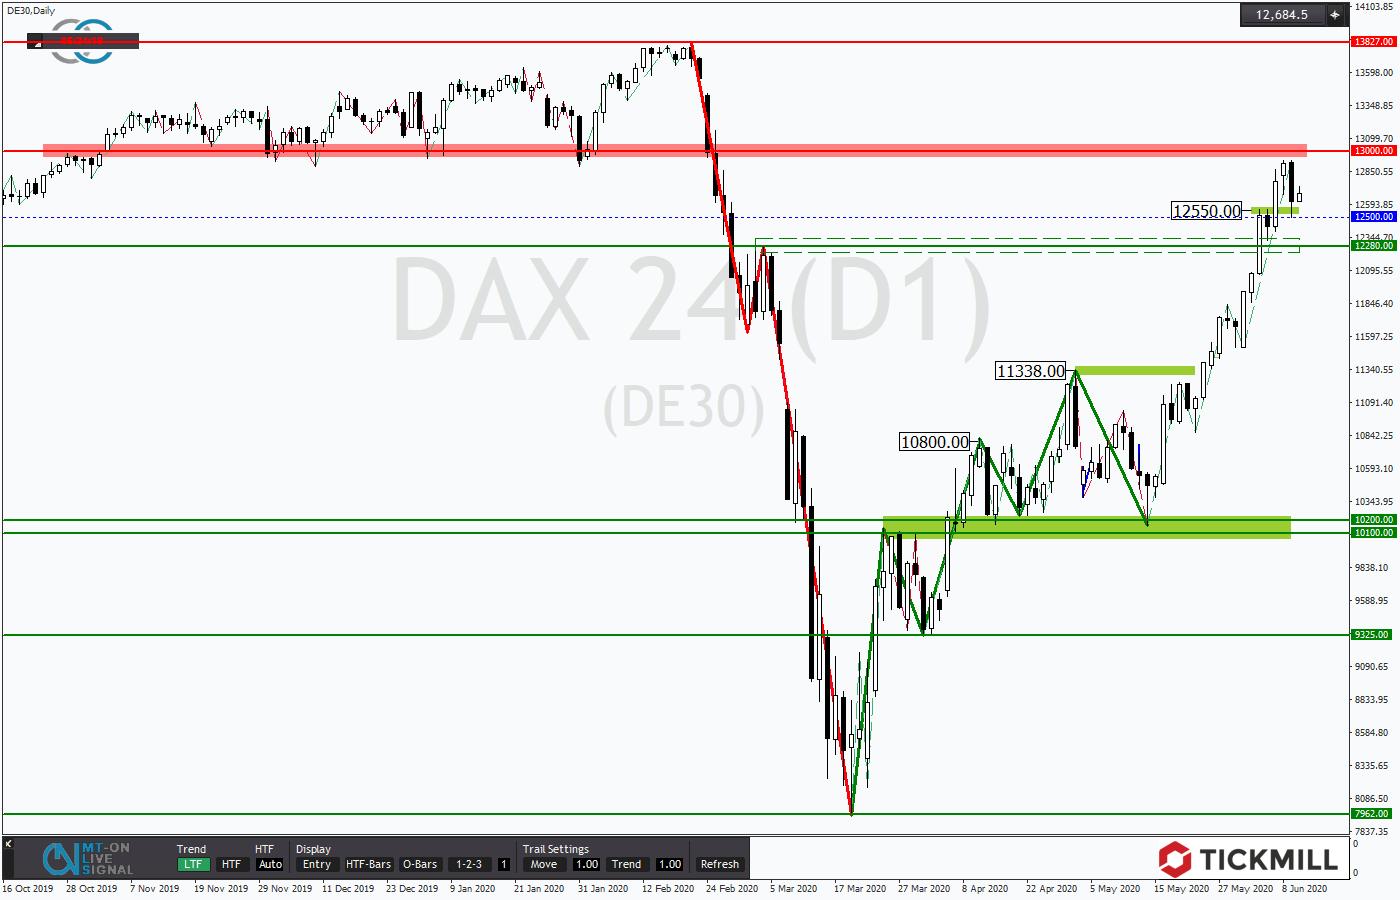 Tickmill-Analyse: Dax im Tagestrend